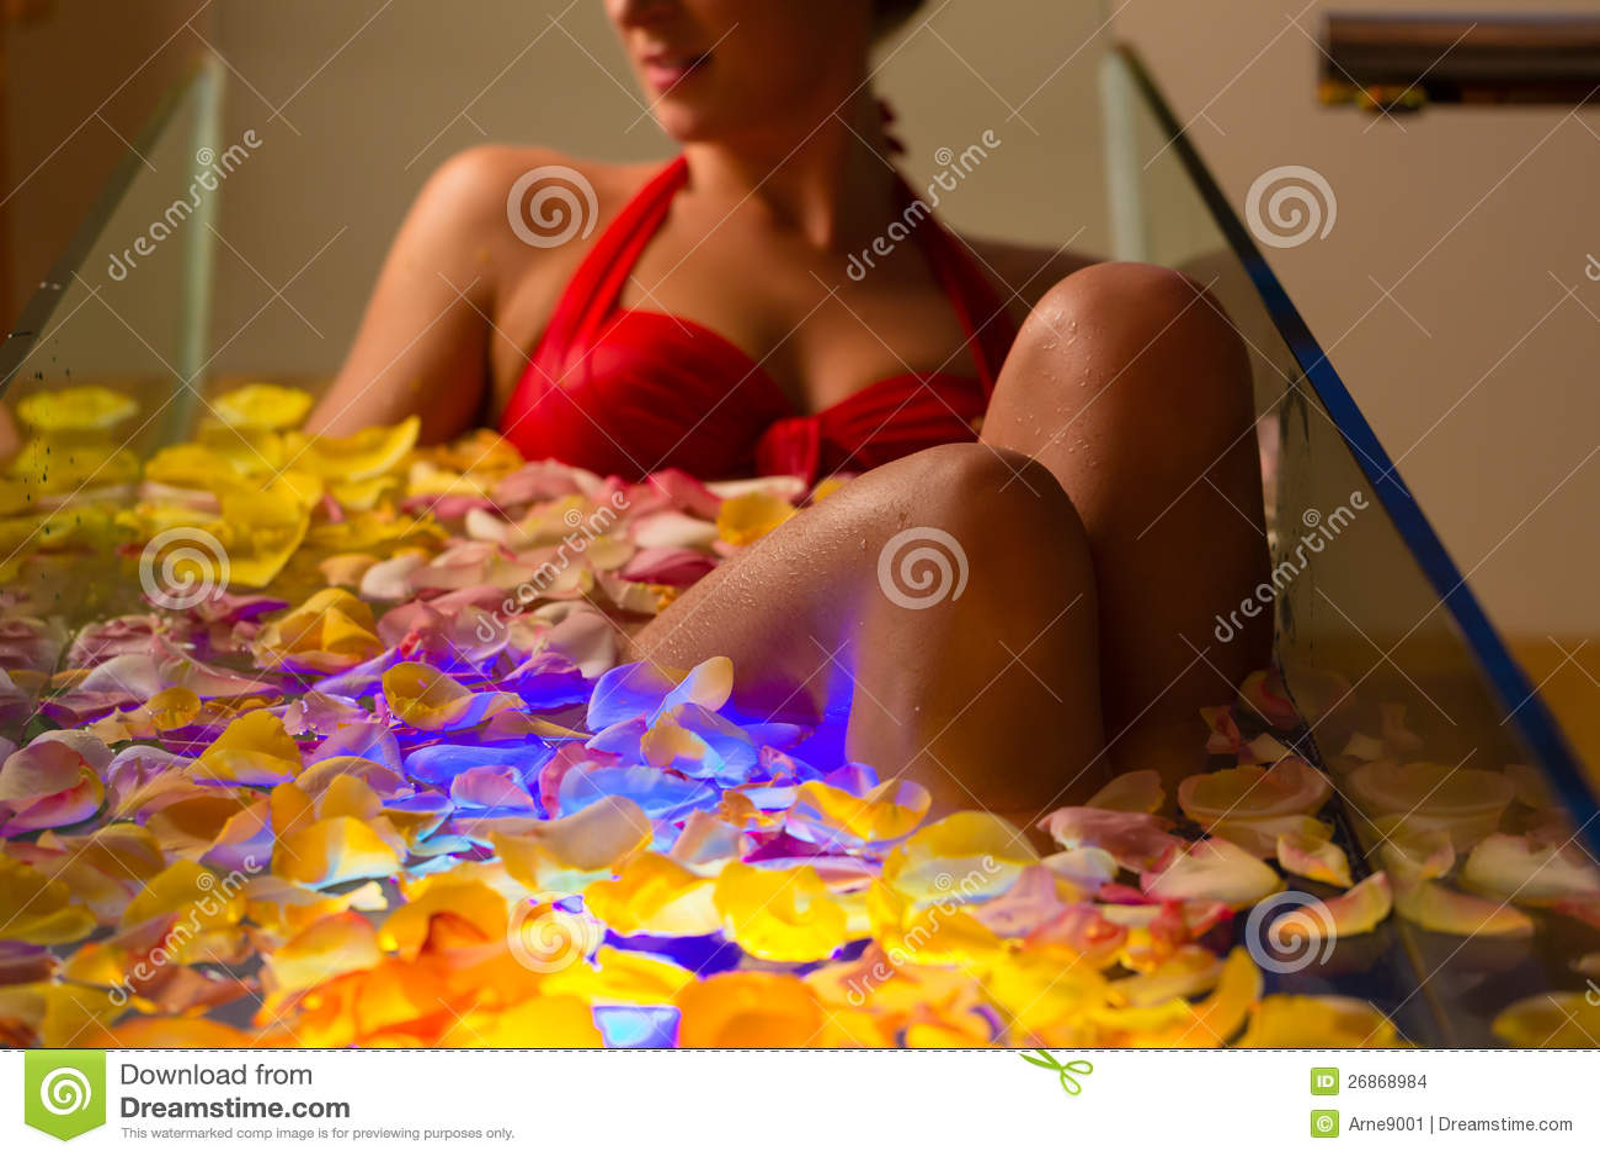 Frau, die im Badekurort mit Farbentherapie badet